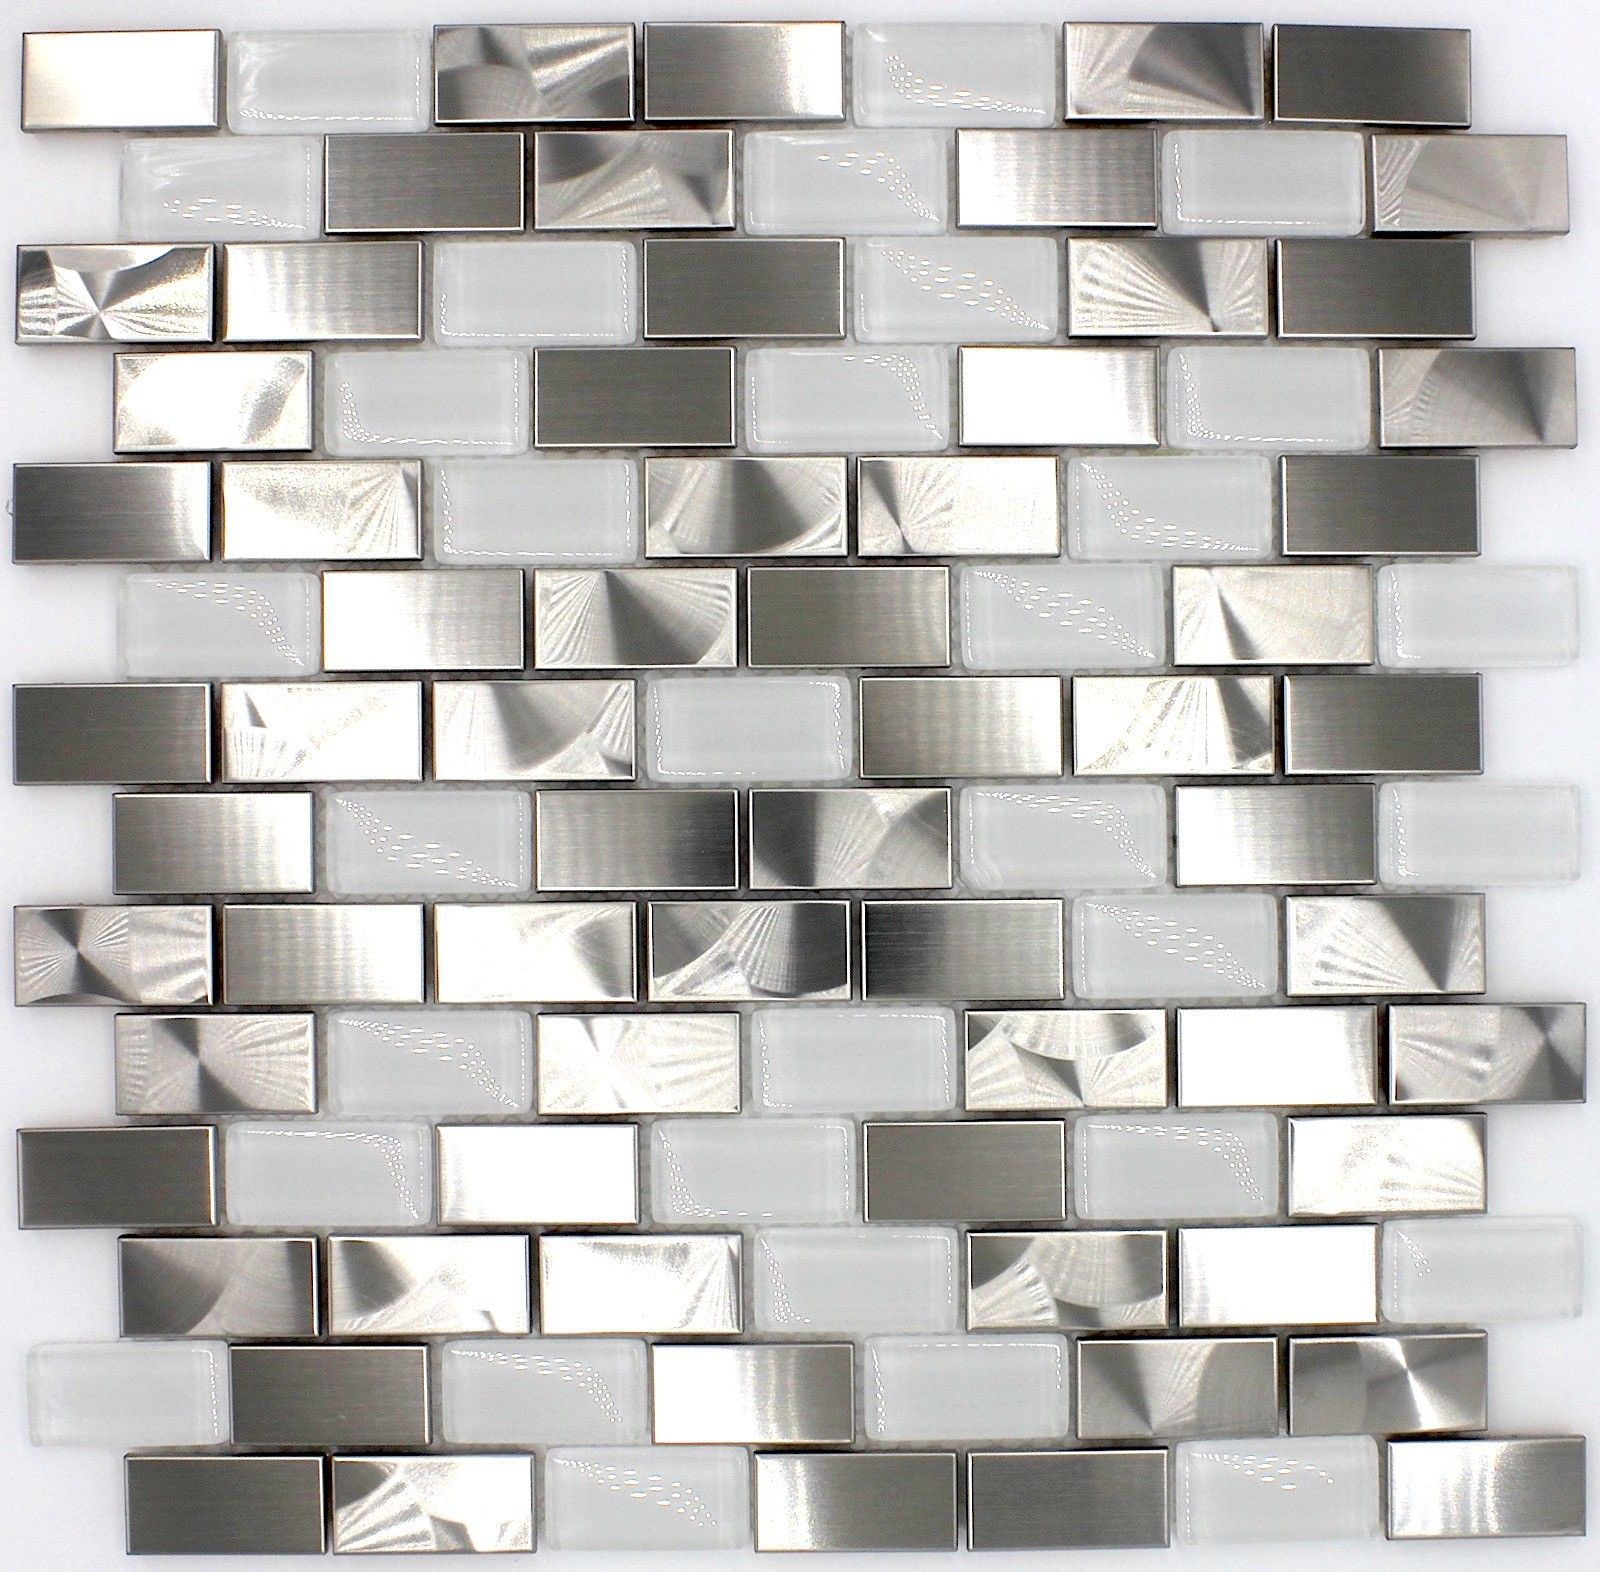 piastrelle mosaico in inox cucina e bagno mi-mul-bri 16,90 € https ...